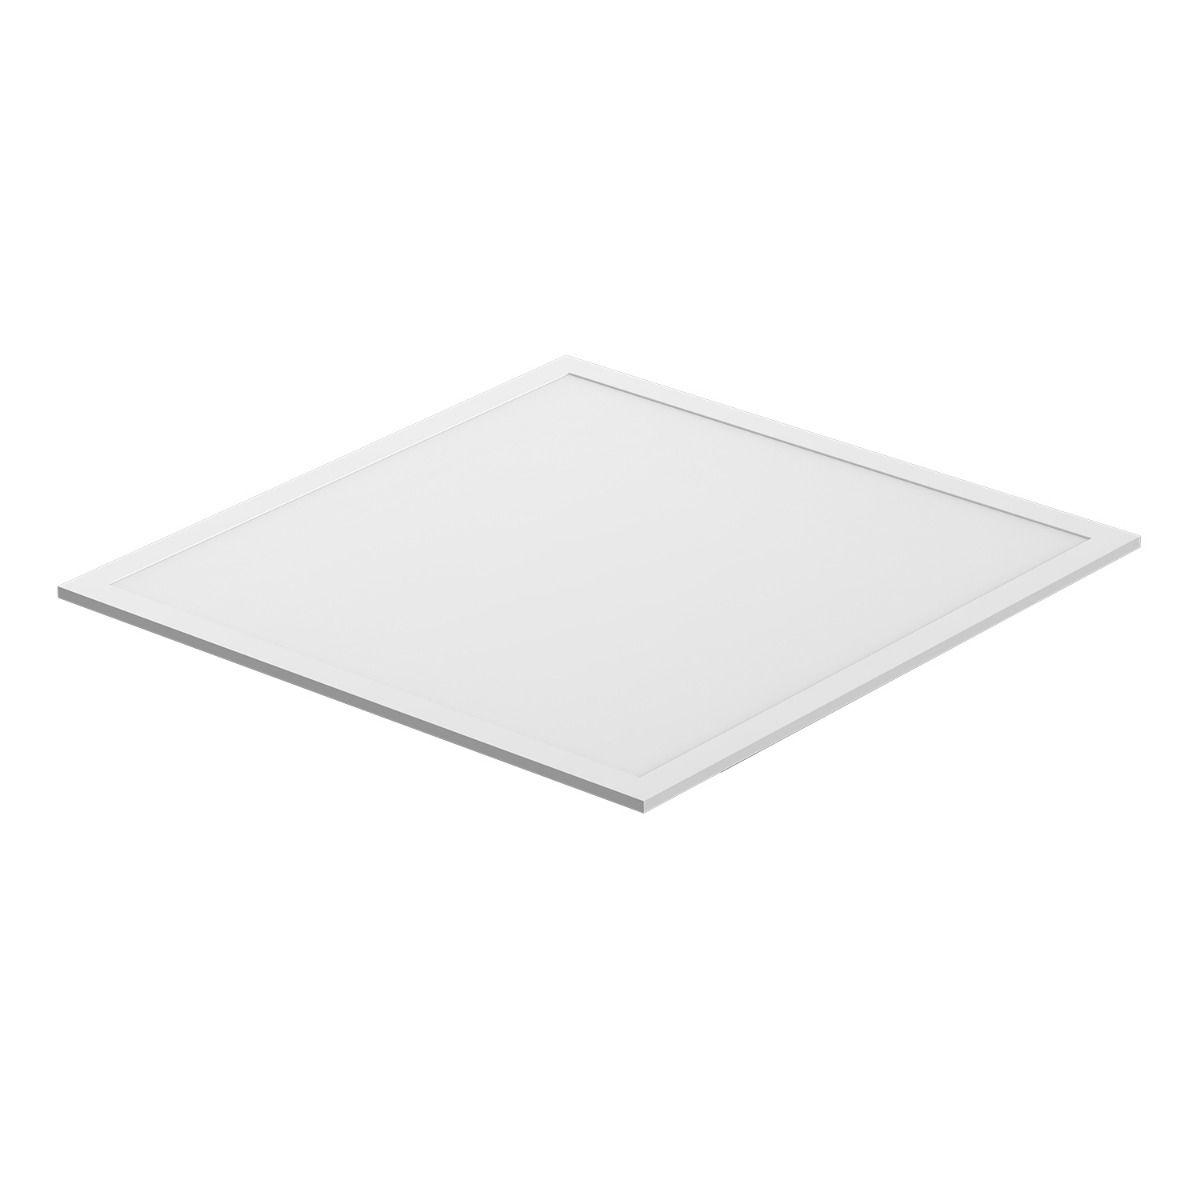 Noxion LED panel Delta Pro Highlum V2.0 Xitanium DALI 40W 60x60cm 3000K 5280lm UGR <19 | Dali dimbar - varm hvit - erstatter 4x18W